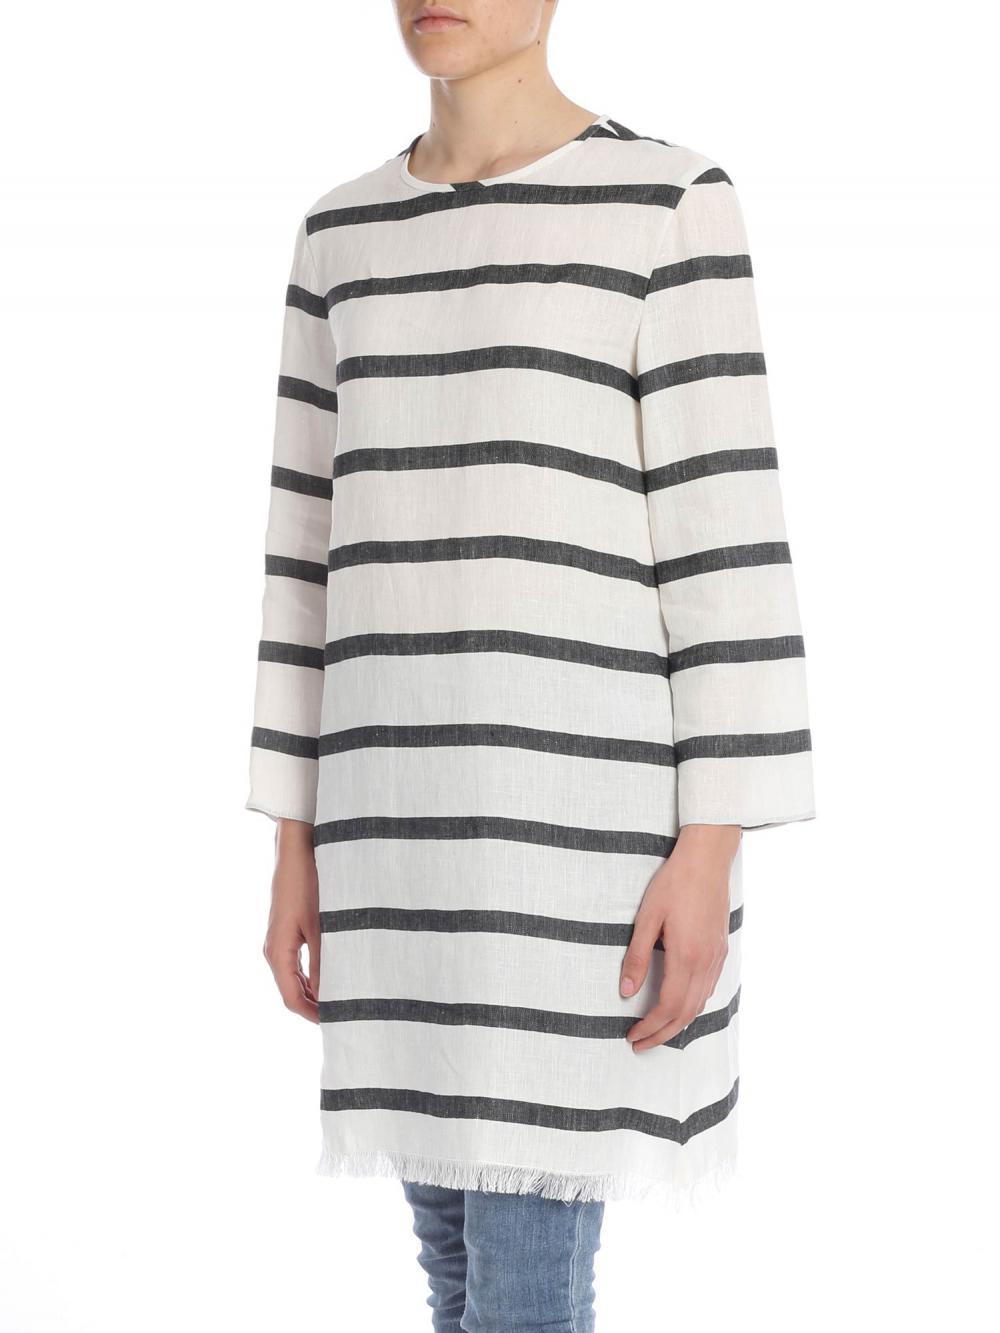 mini-dress-s-max-mara-cod-91910892000norma